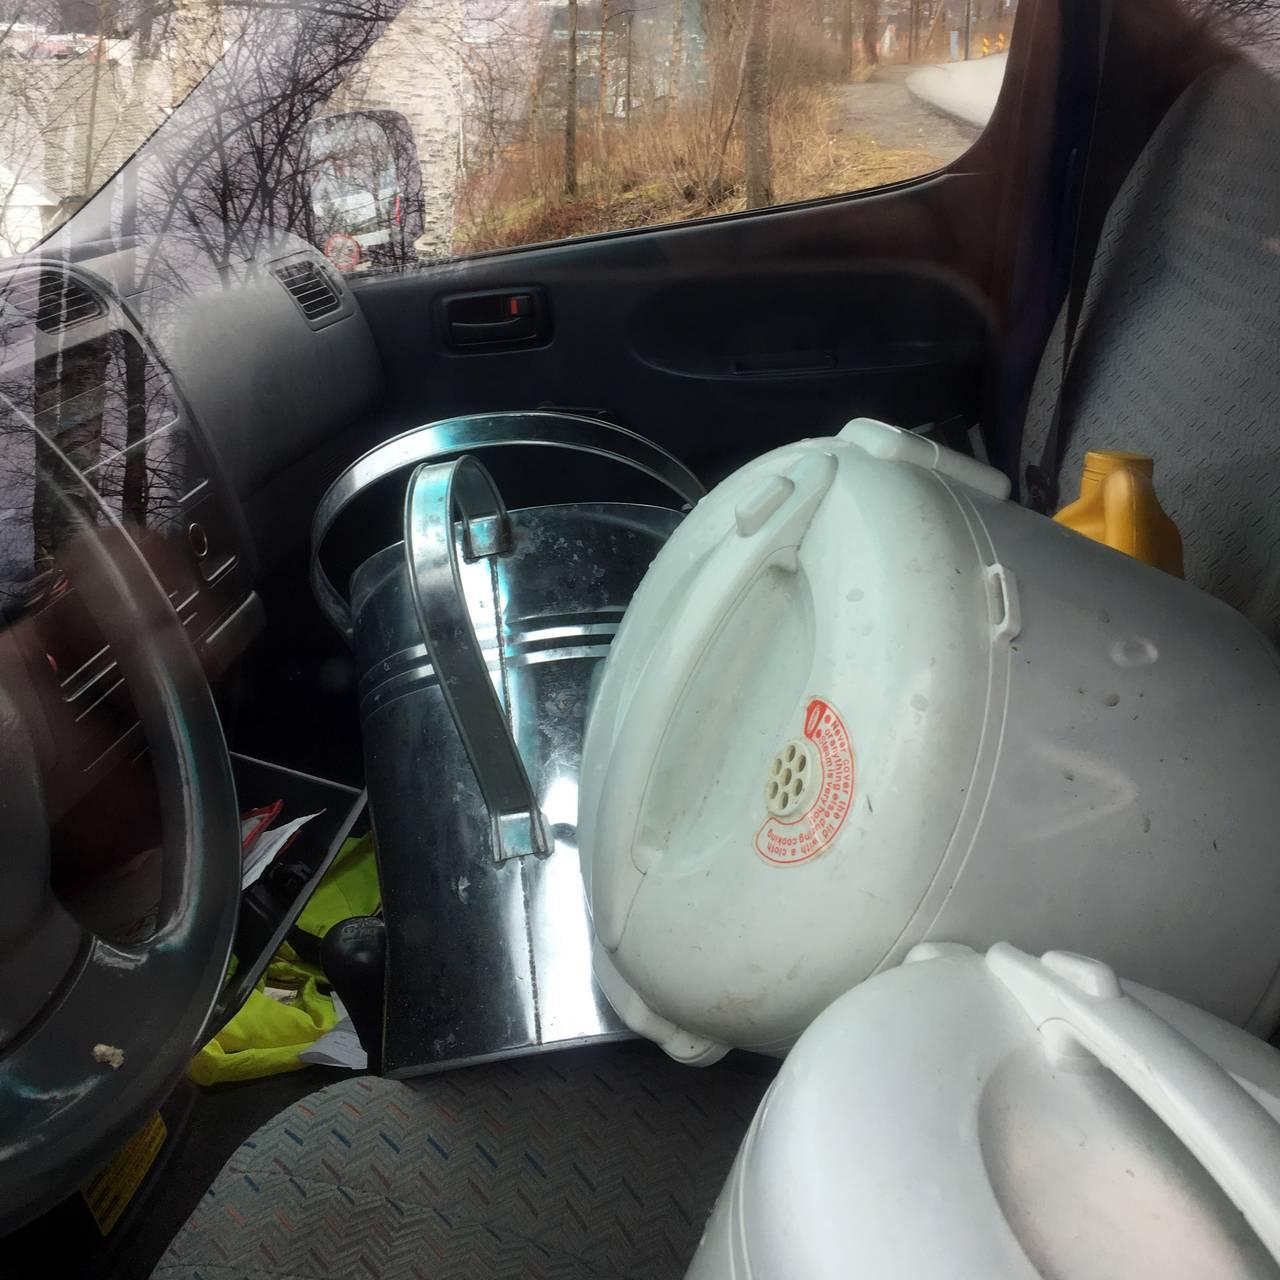 Søppel i avskiltet bil -1